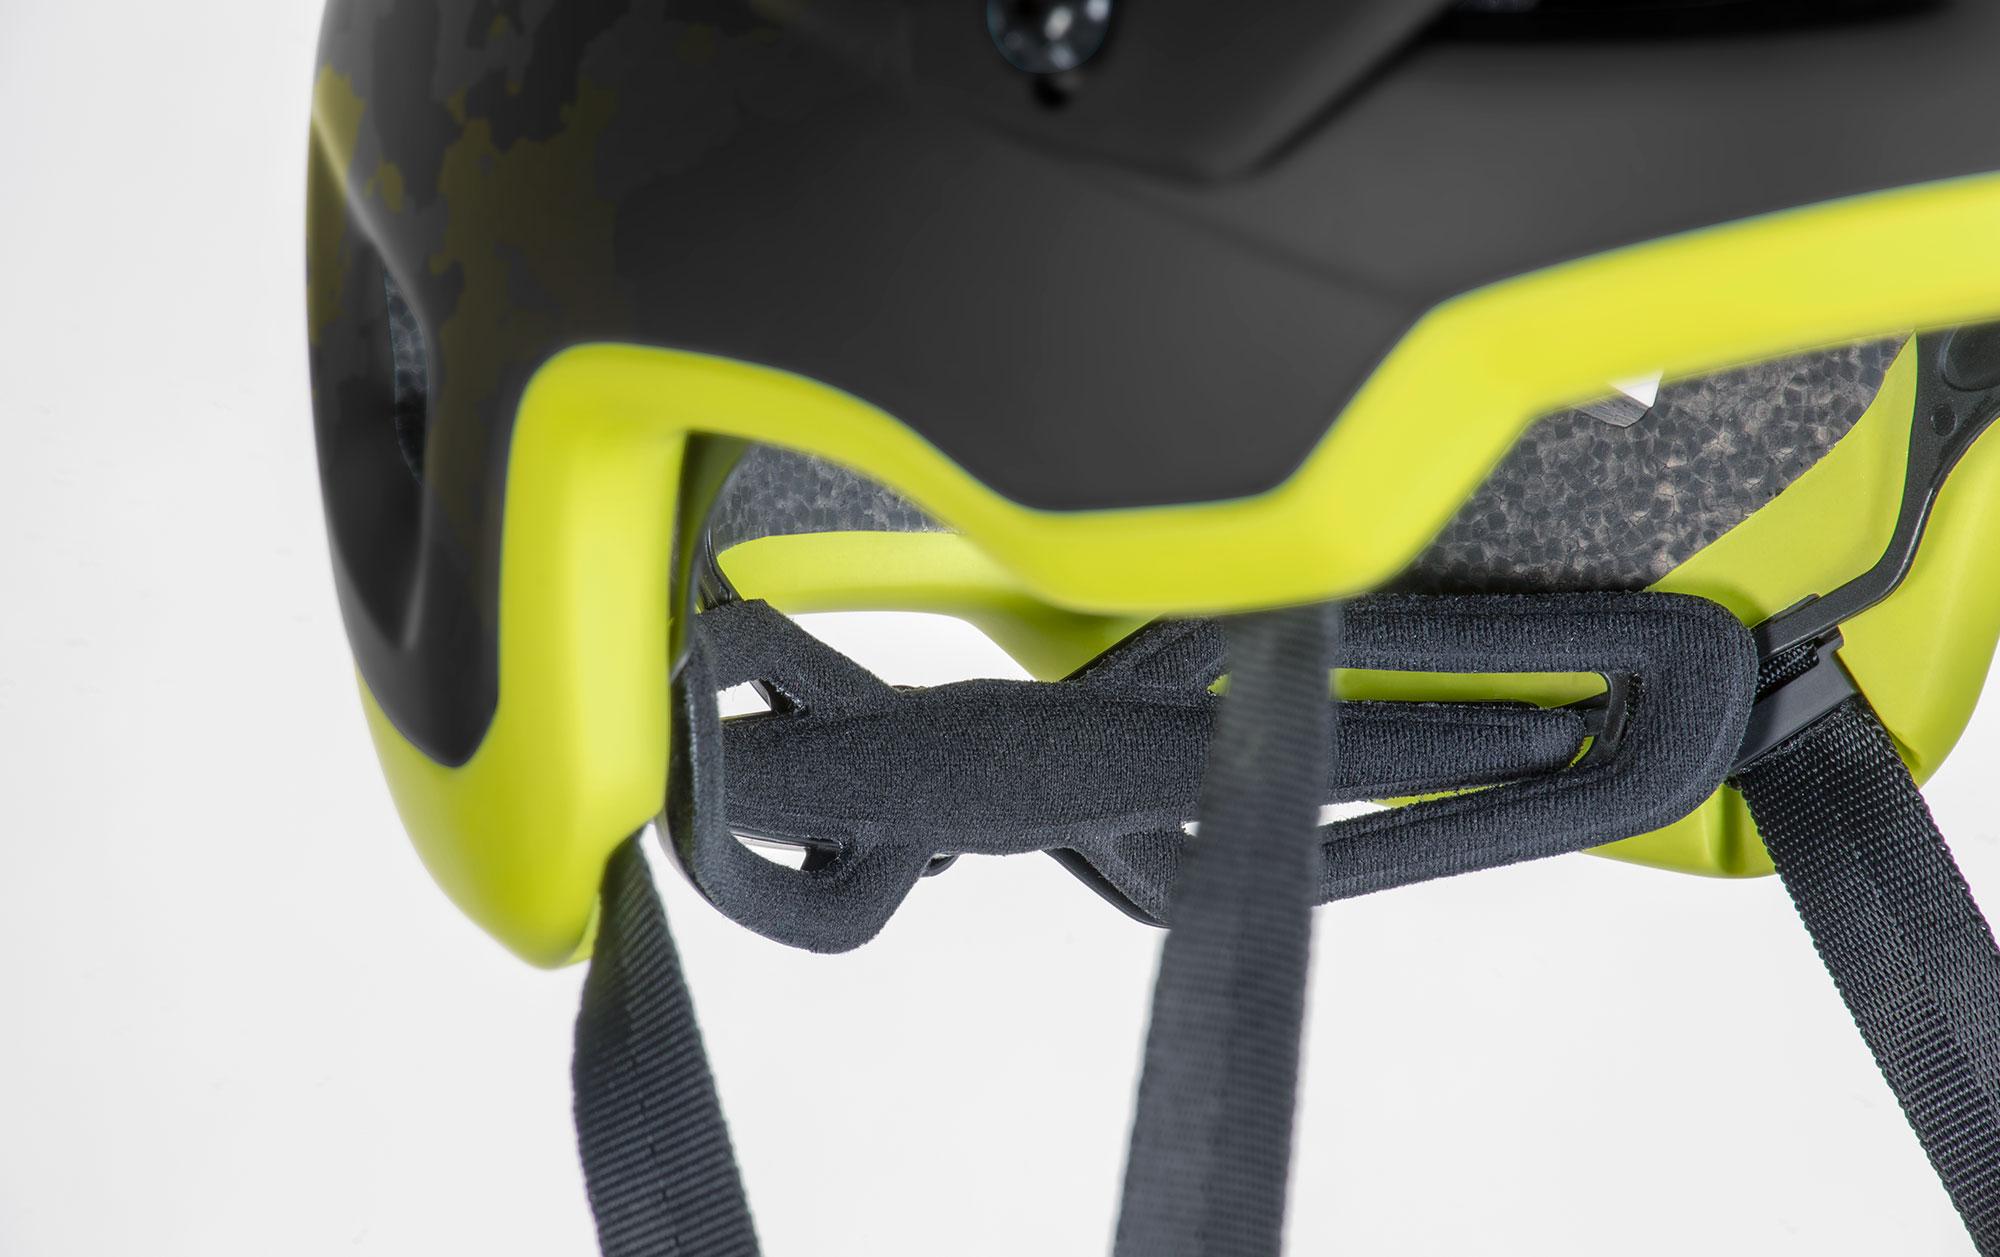 MET Terranova Mips Trail and E-MTB Helmet Retention System